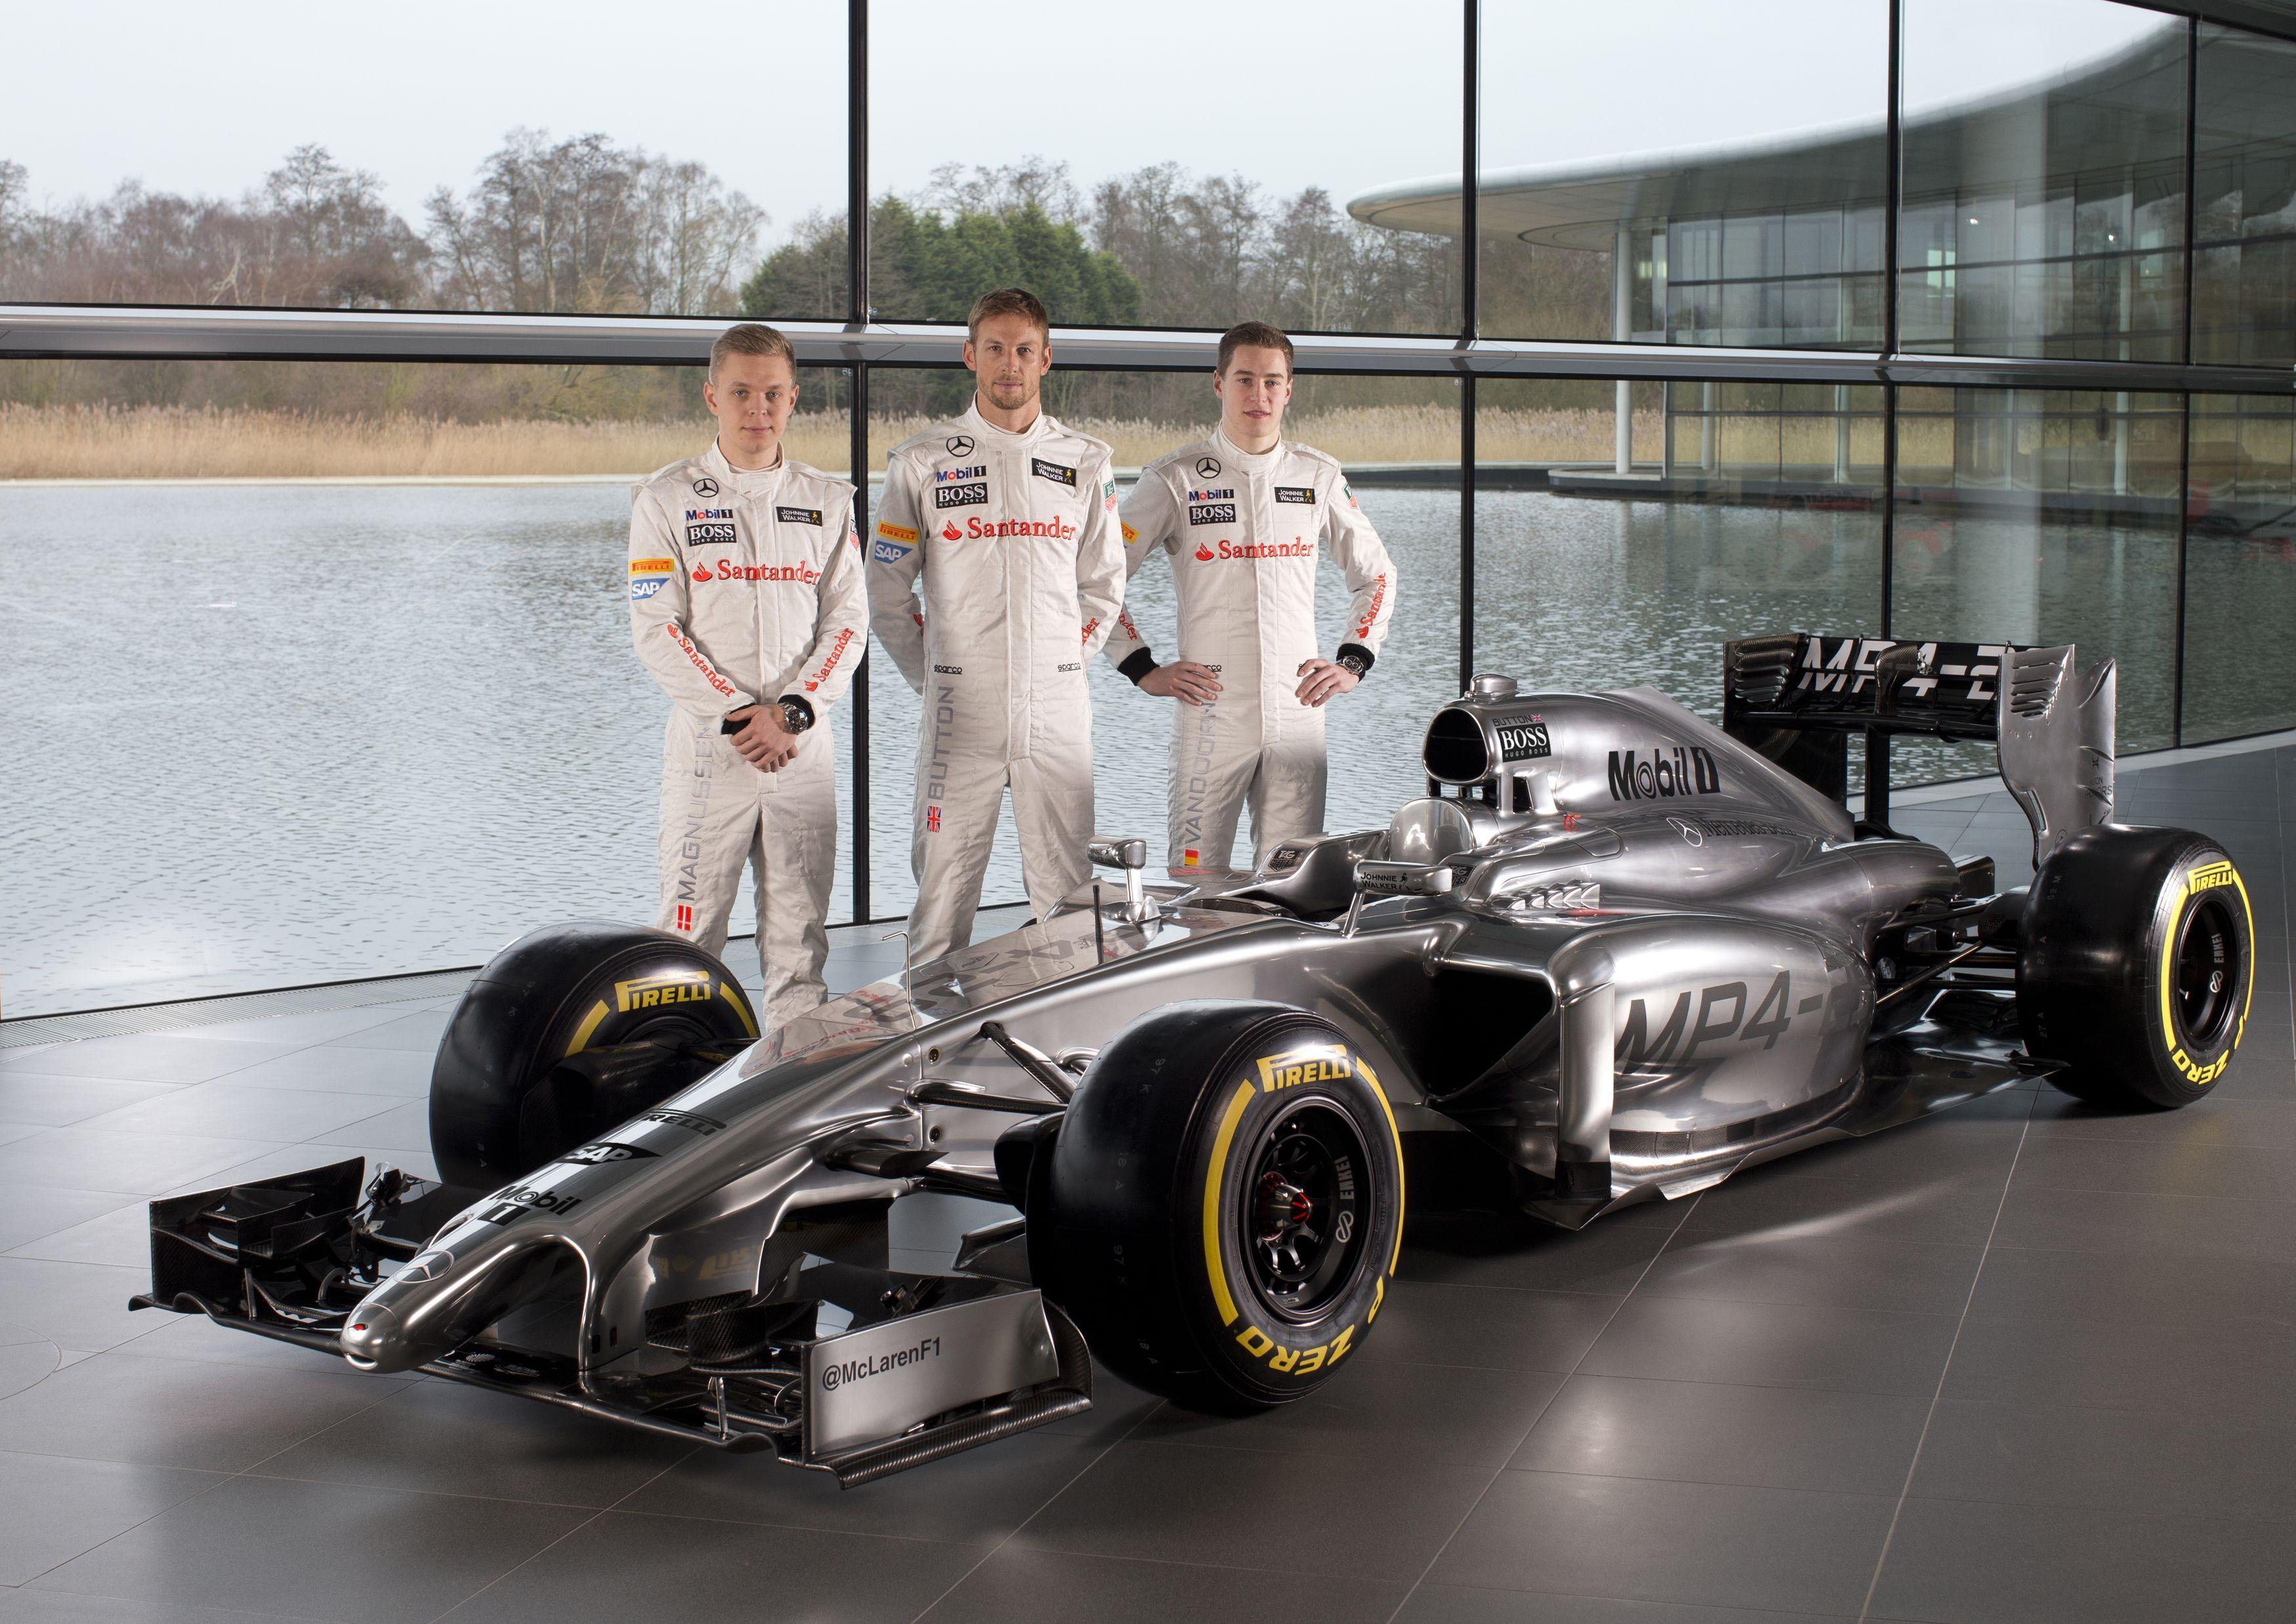 Gallery: Formula One – McLaren MP4-29 Launch 2014